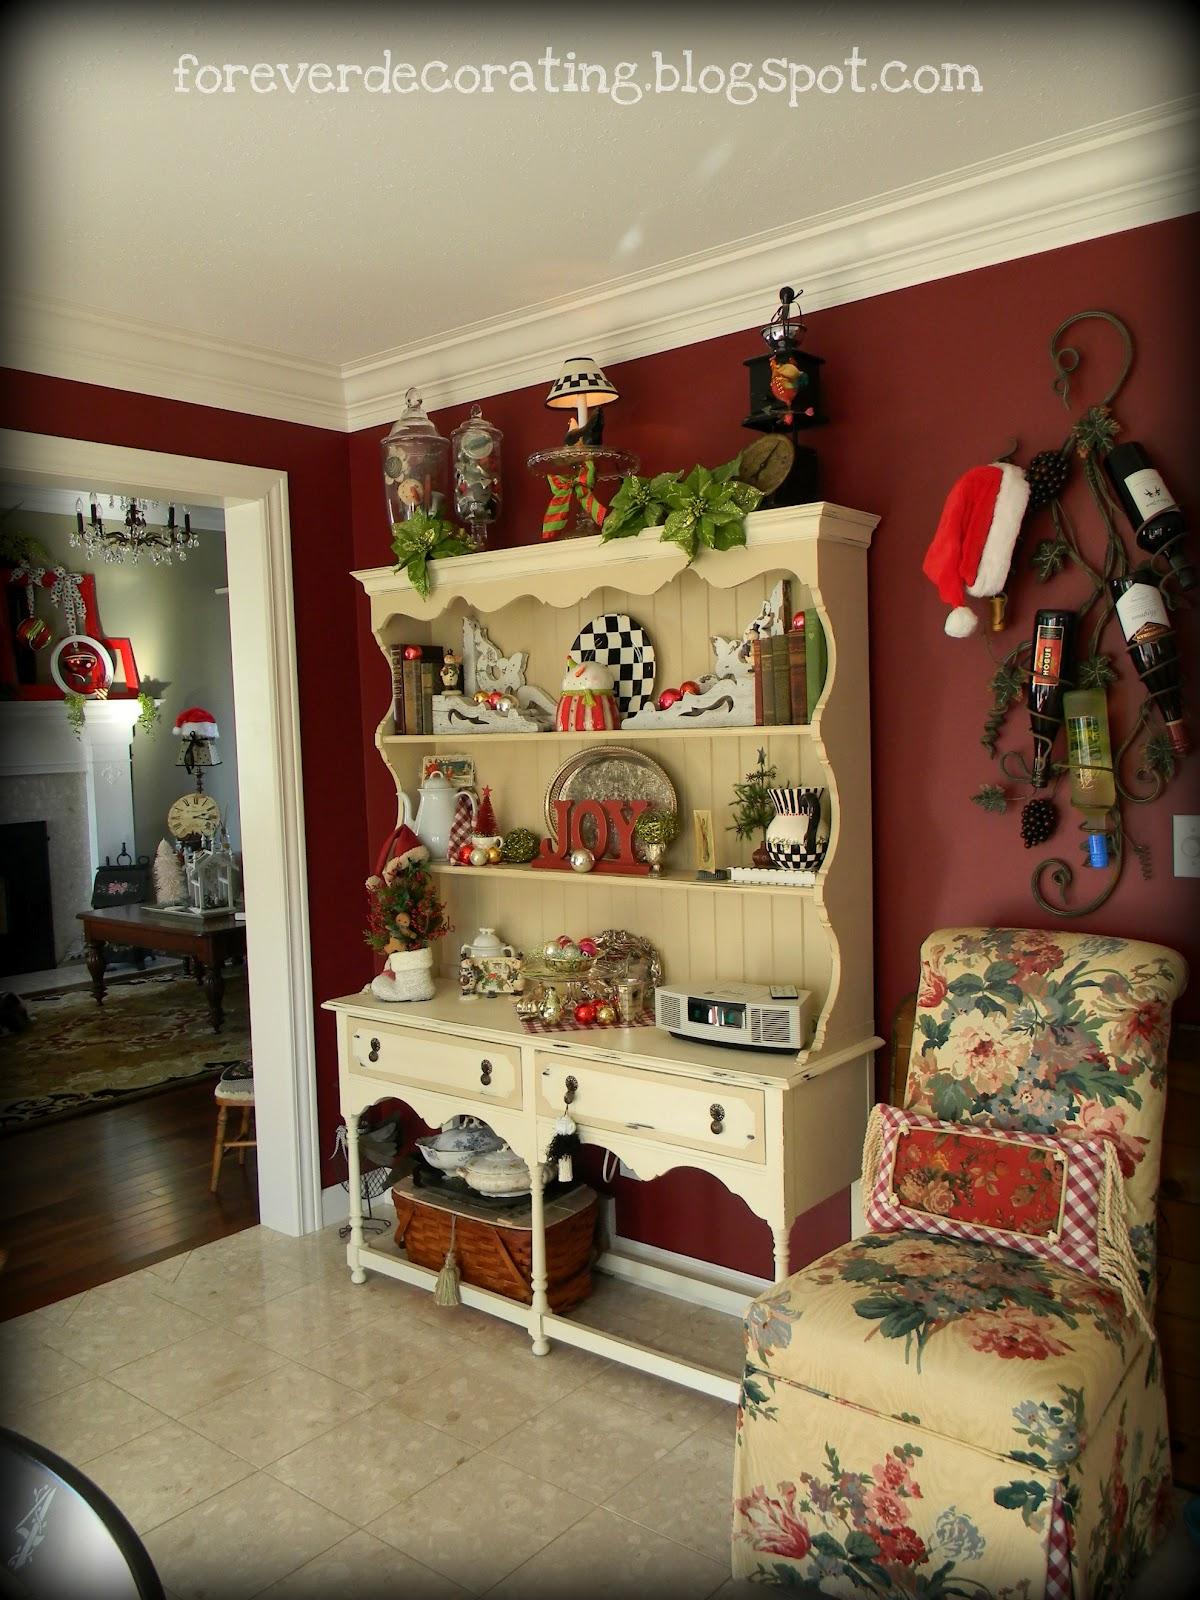 Forever Decorating!: Hutch Decor 101-107